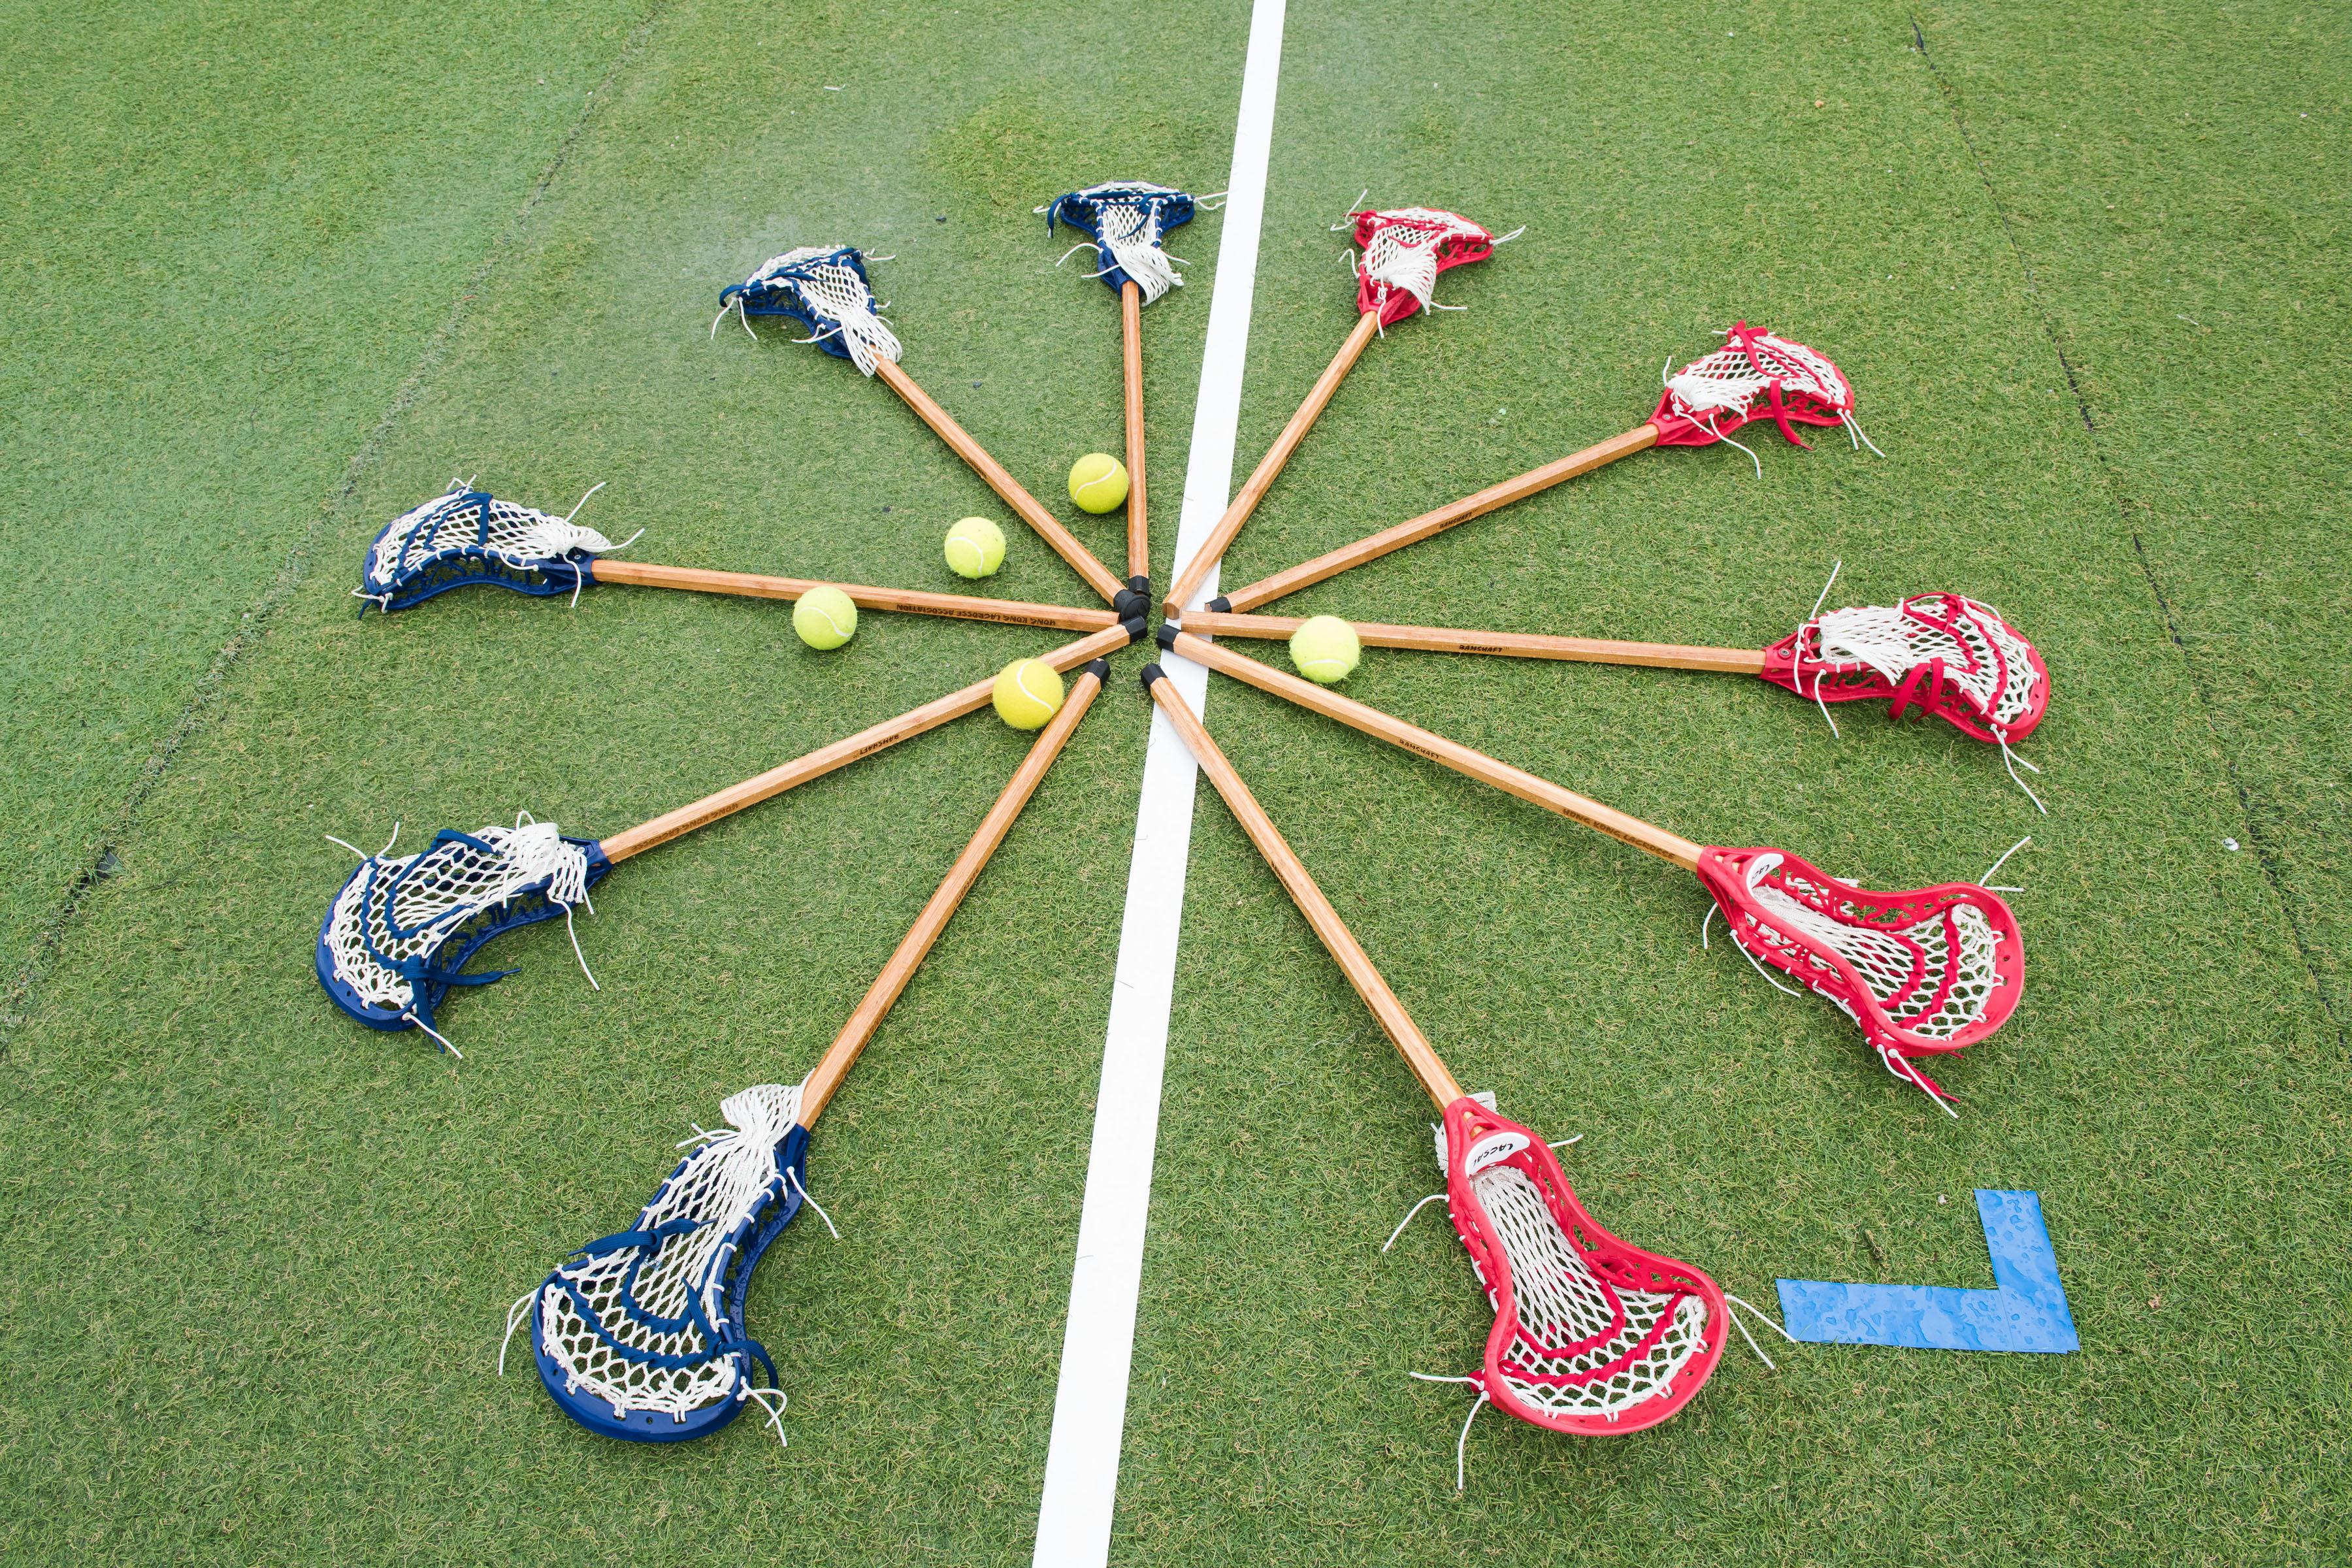 棍網球 Lacrosse